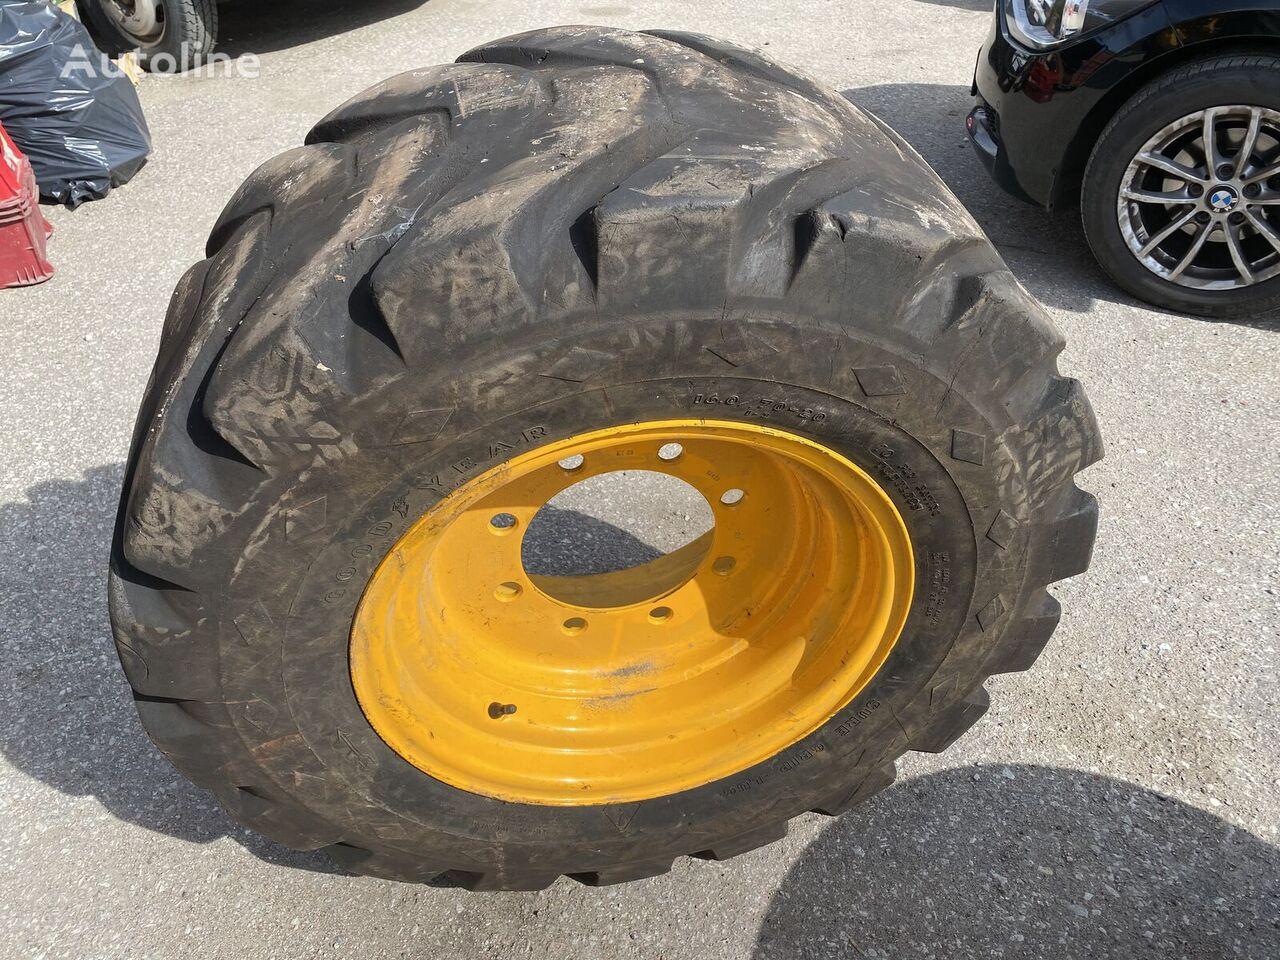 Goodyear 16.00-20.00 wheel